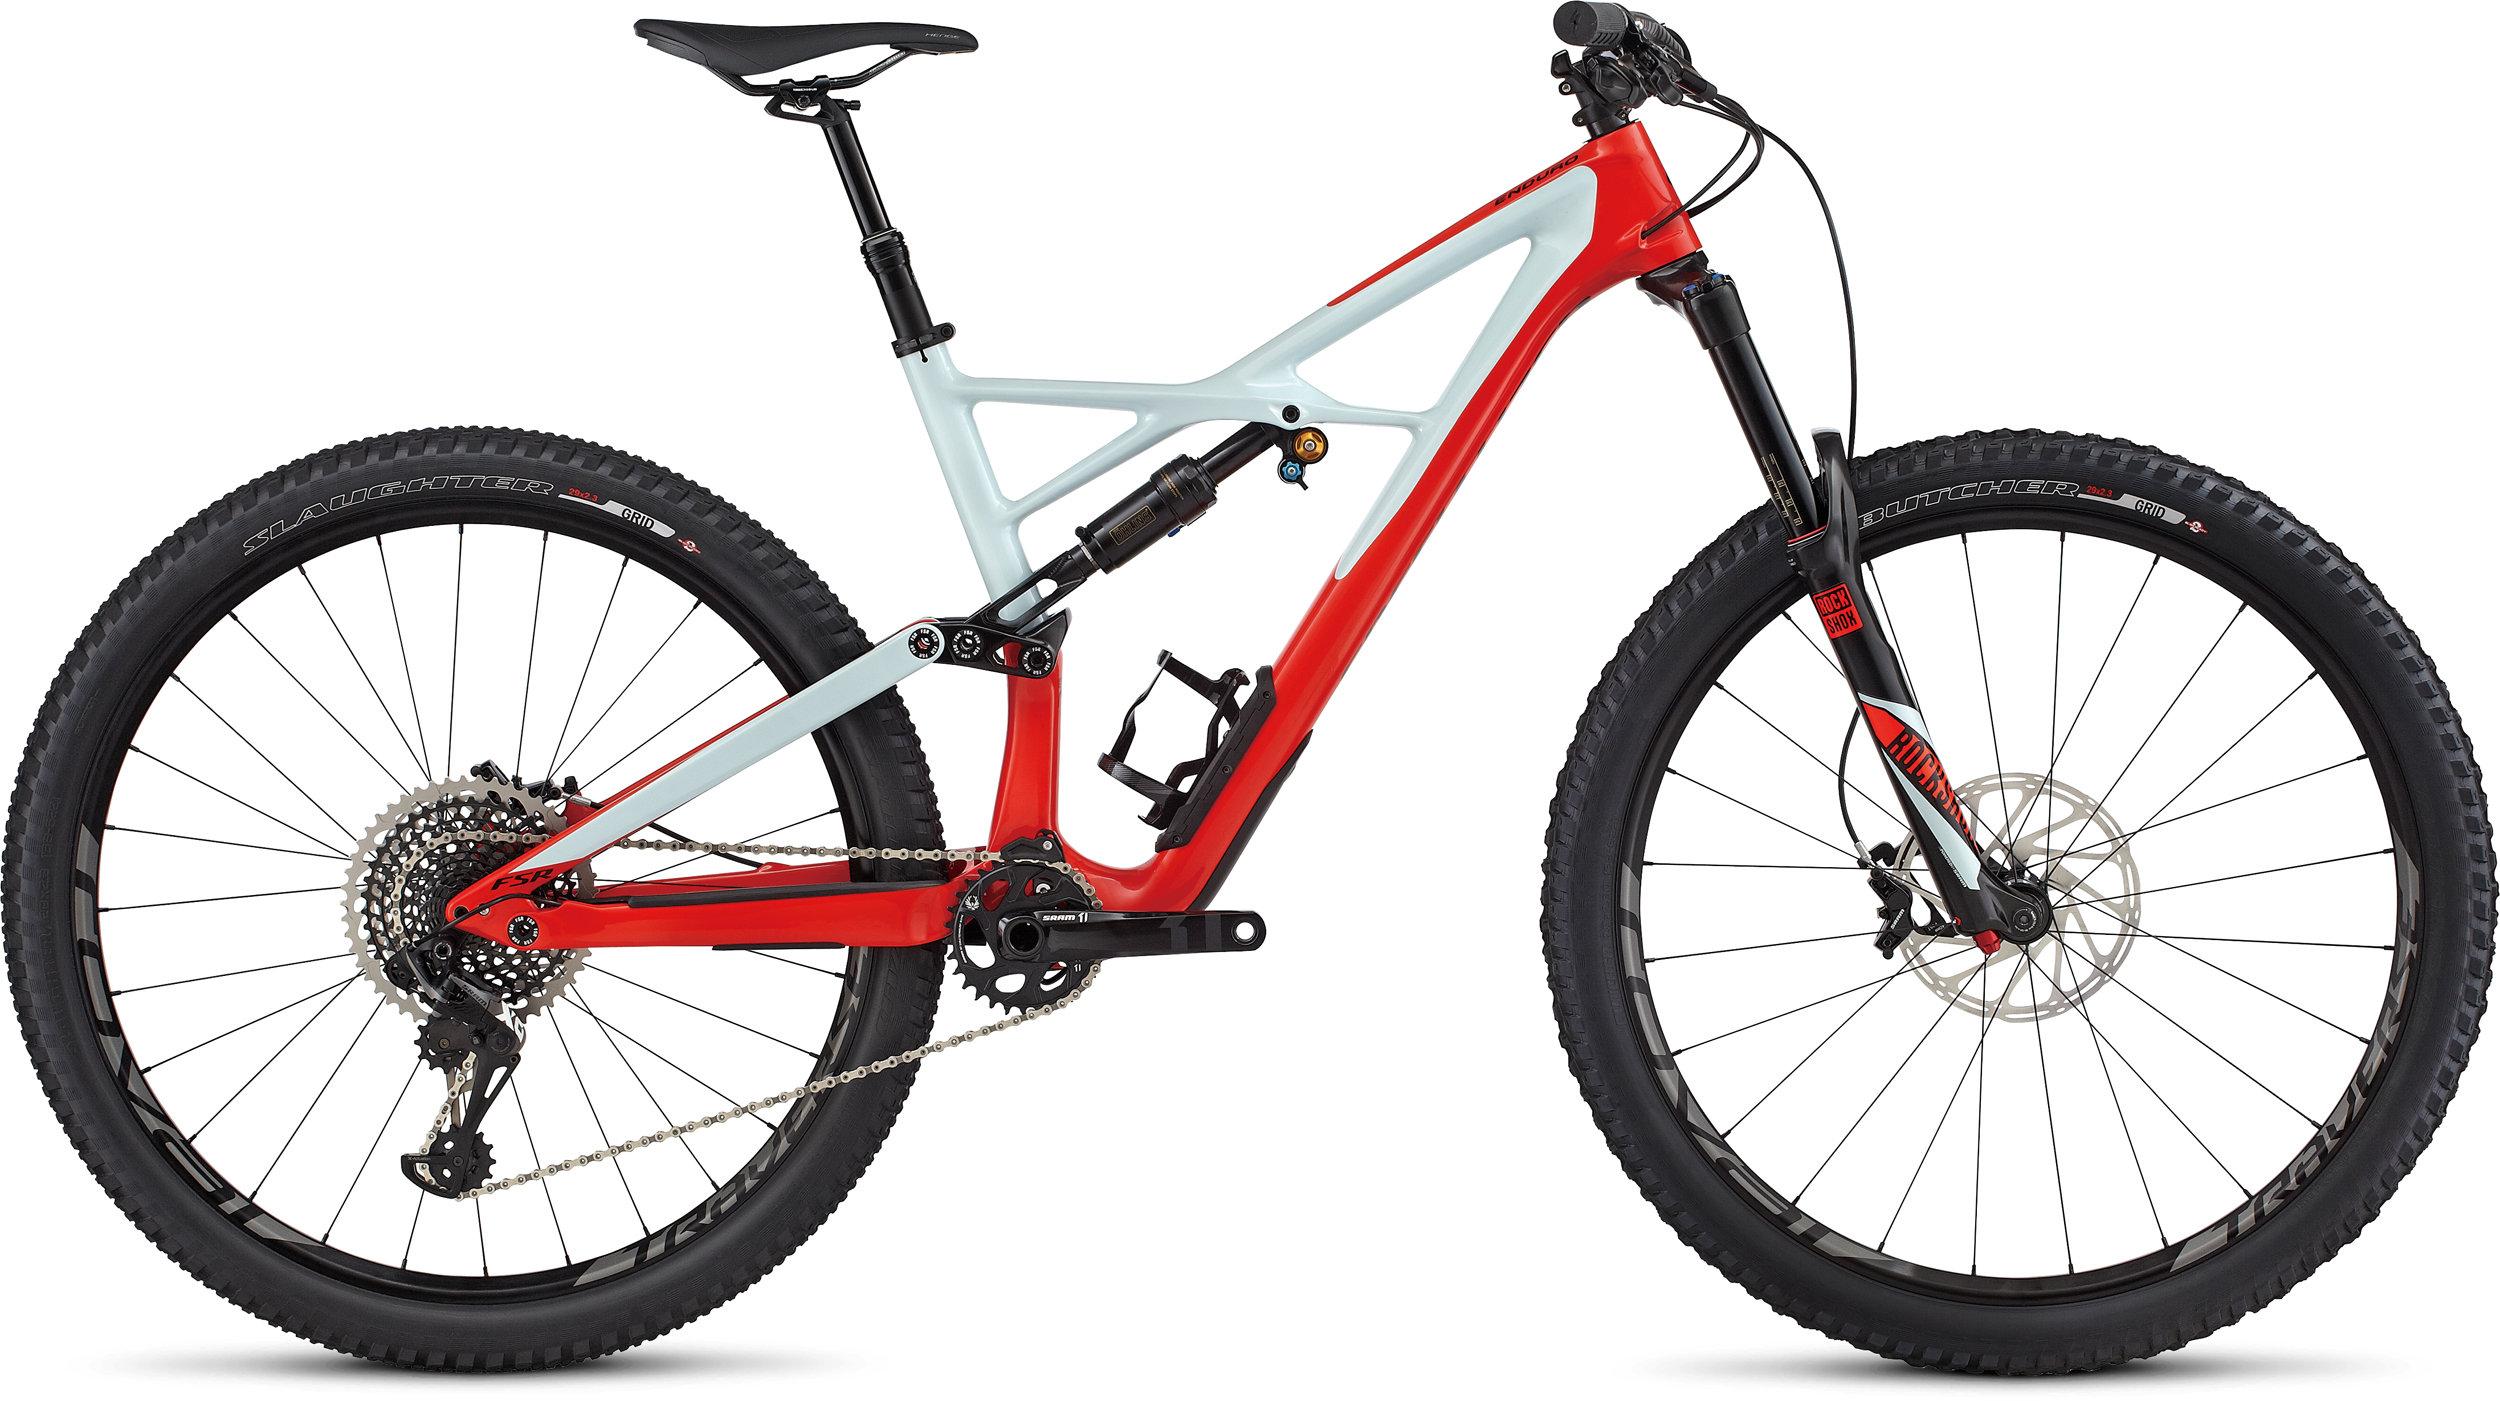 SPECIALIZED ENDURO FSR PRO CARBON 29/6FATTIE RKTRED/BBYBLU/BLK L - Alpha Bikes